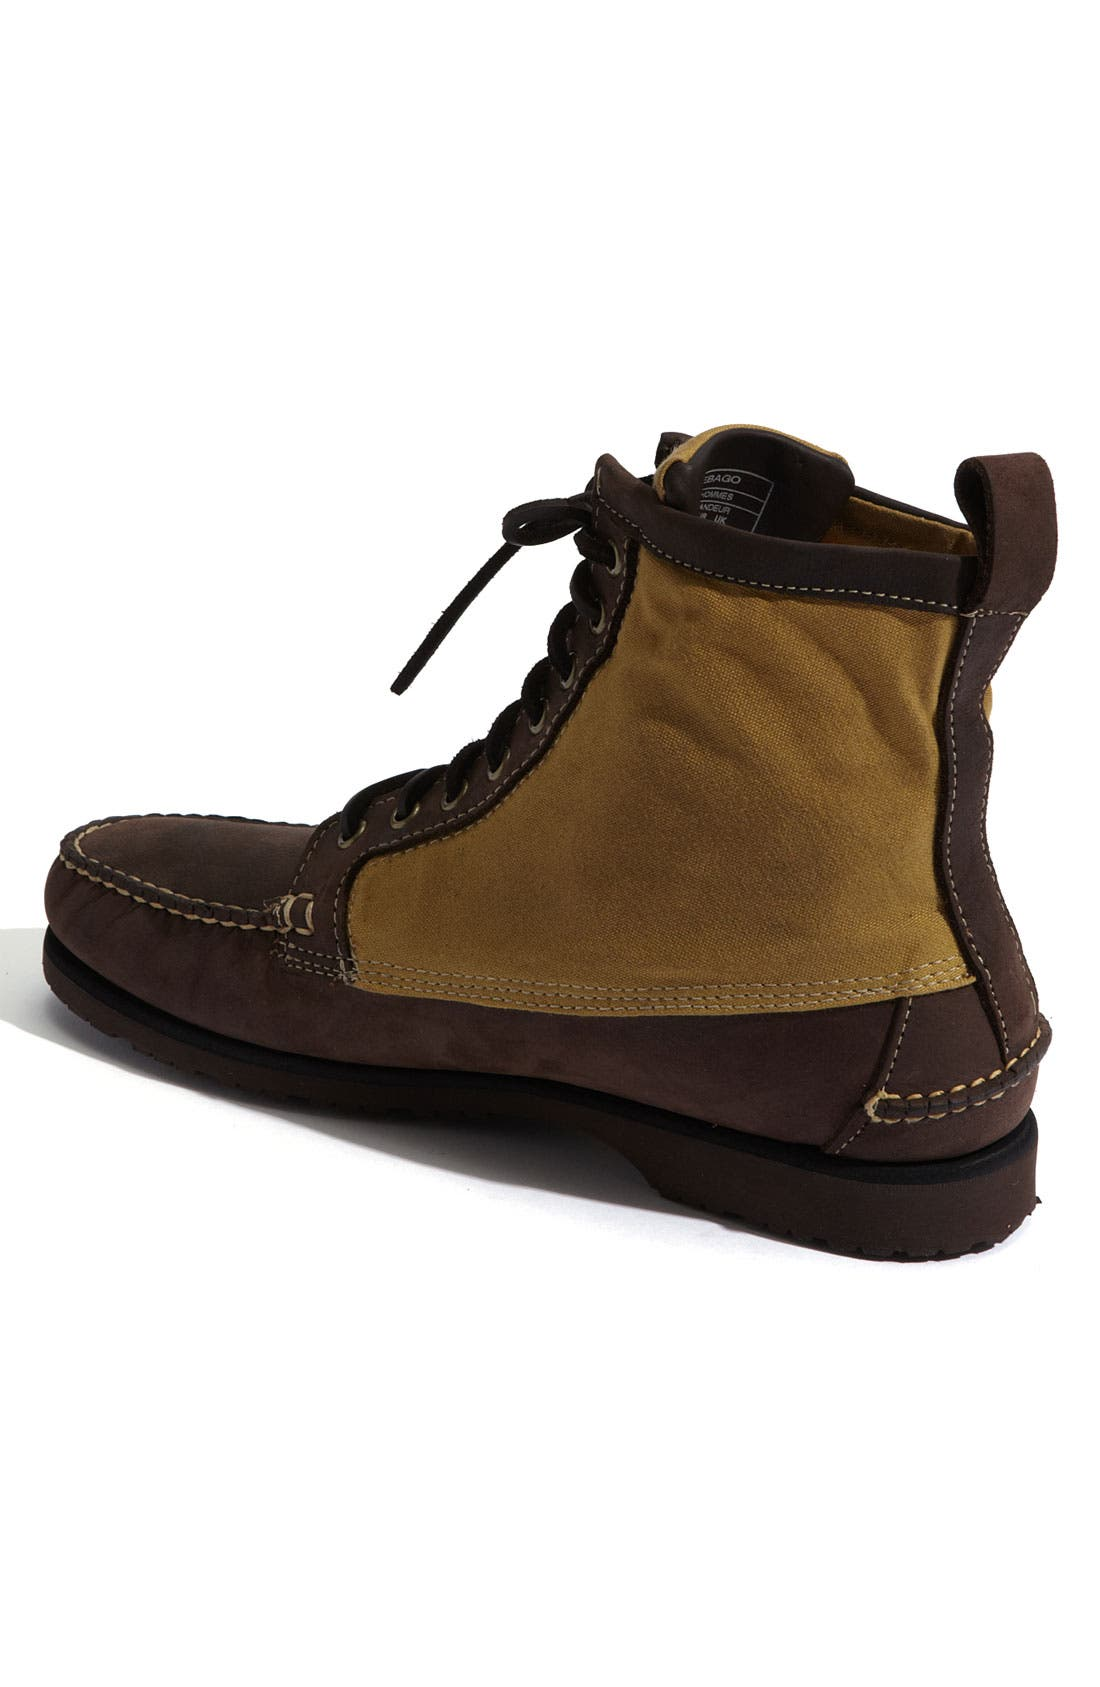 'Kettle' Boot,                             Main thumbnail 1, color,                             200